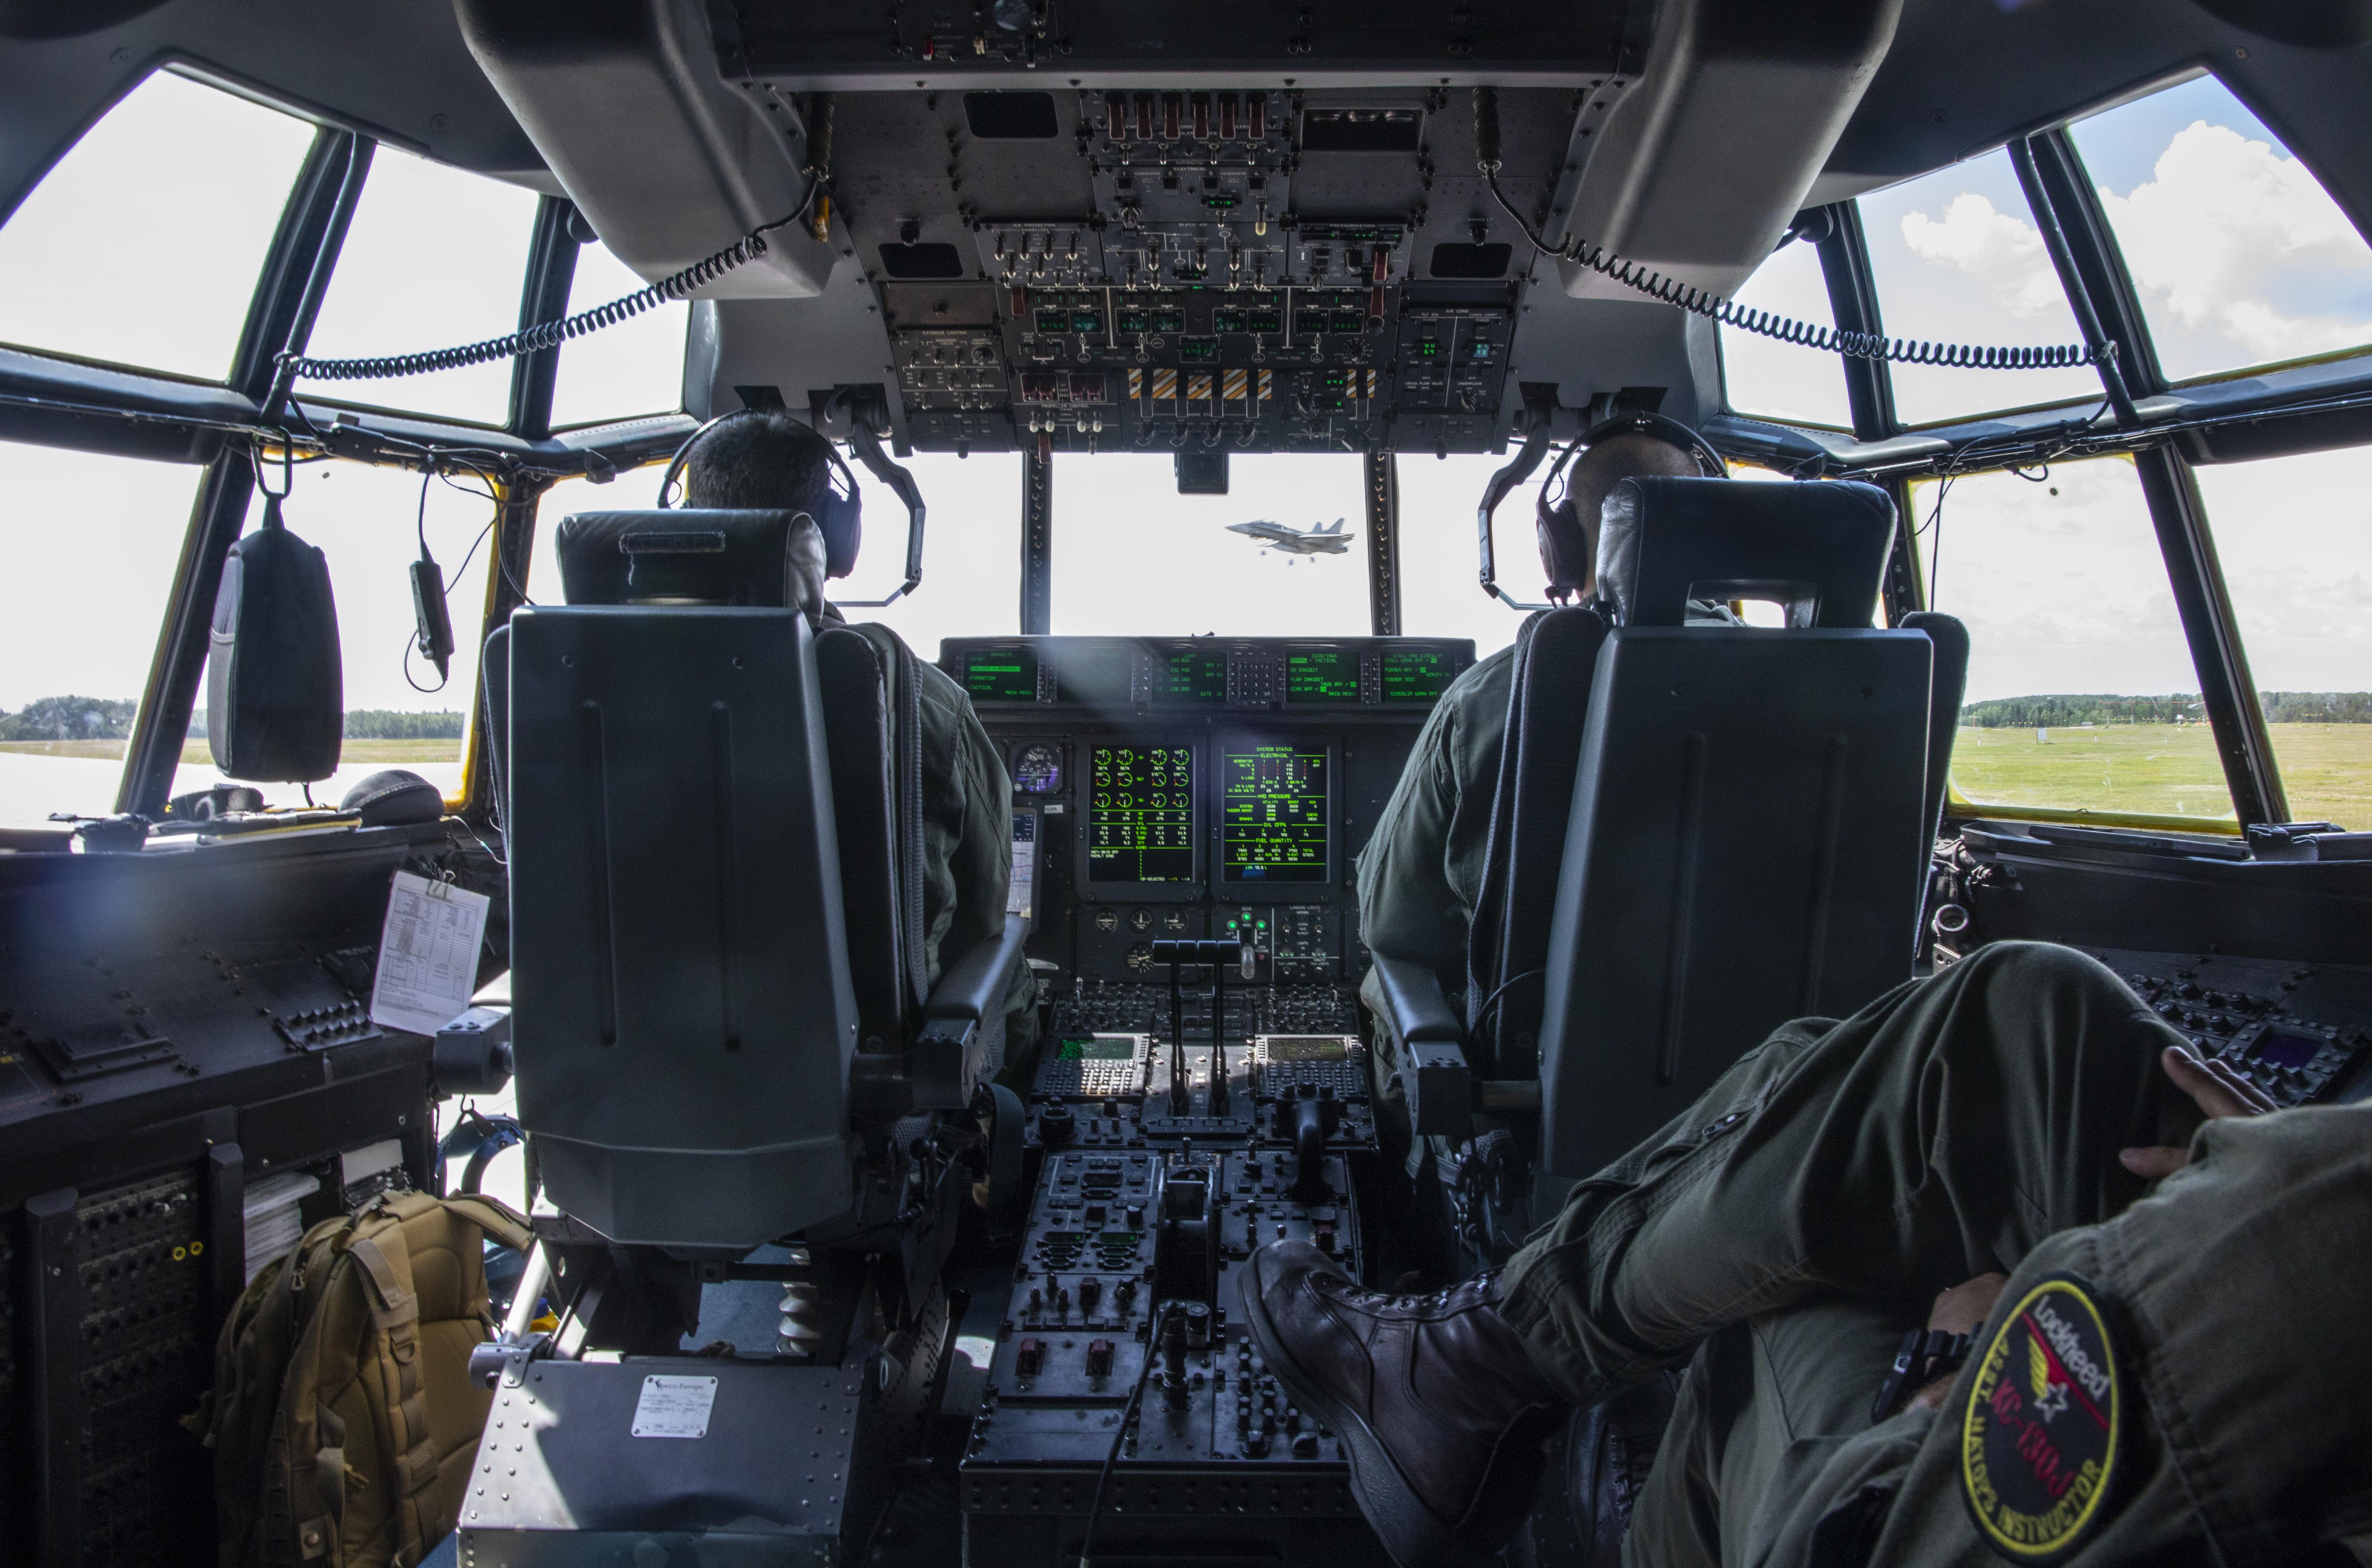 U S  Marine Corps KC-130 Hercules refuel Canadian aircraft